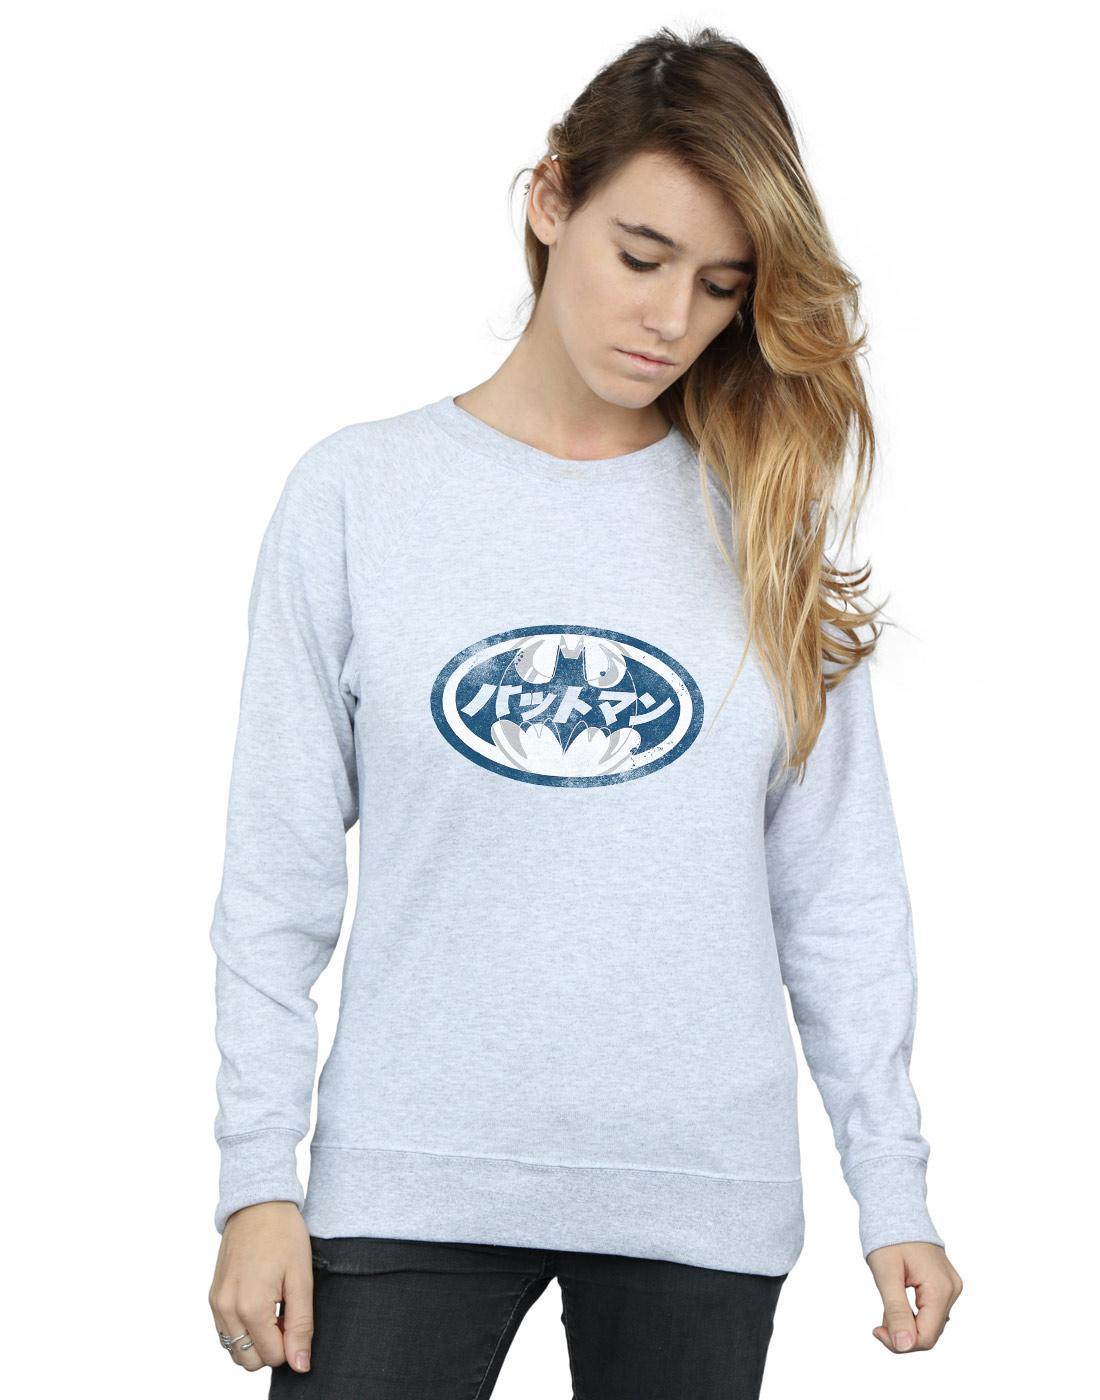 7ef913244 DC Comics Women's Batman Japanese Logo White Sweatshirt | eBay